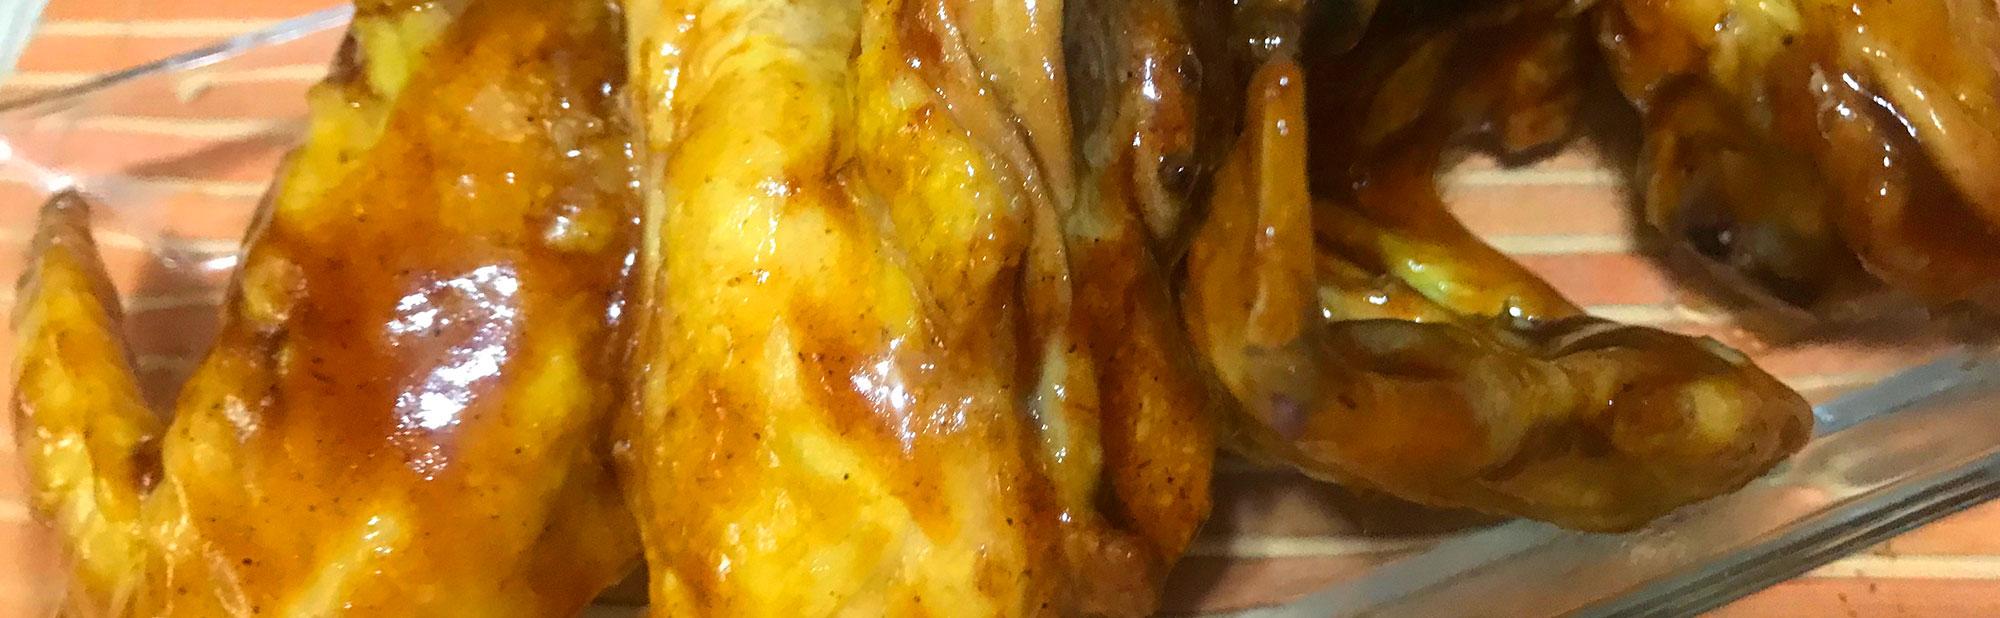 La Antojadera | Alitas BBQ